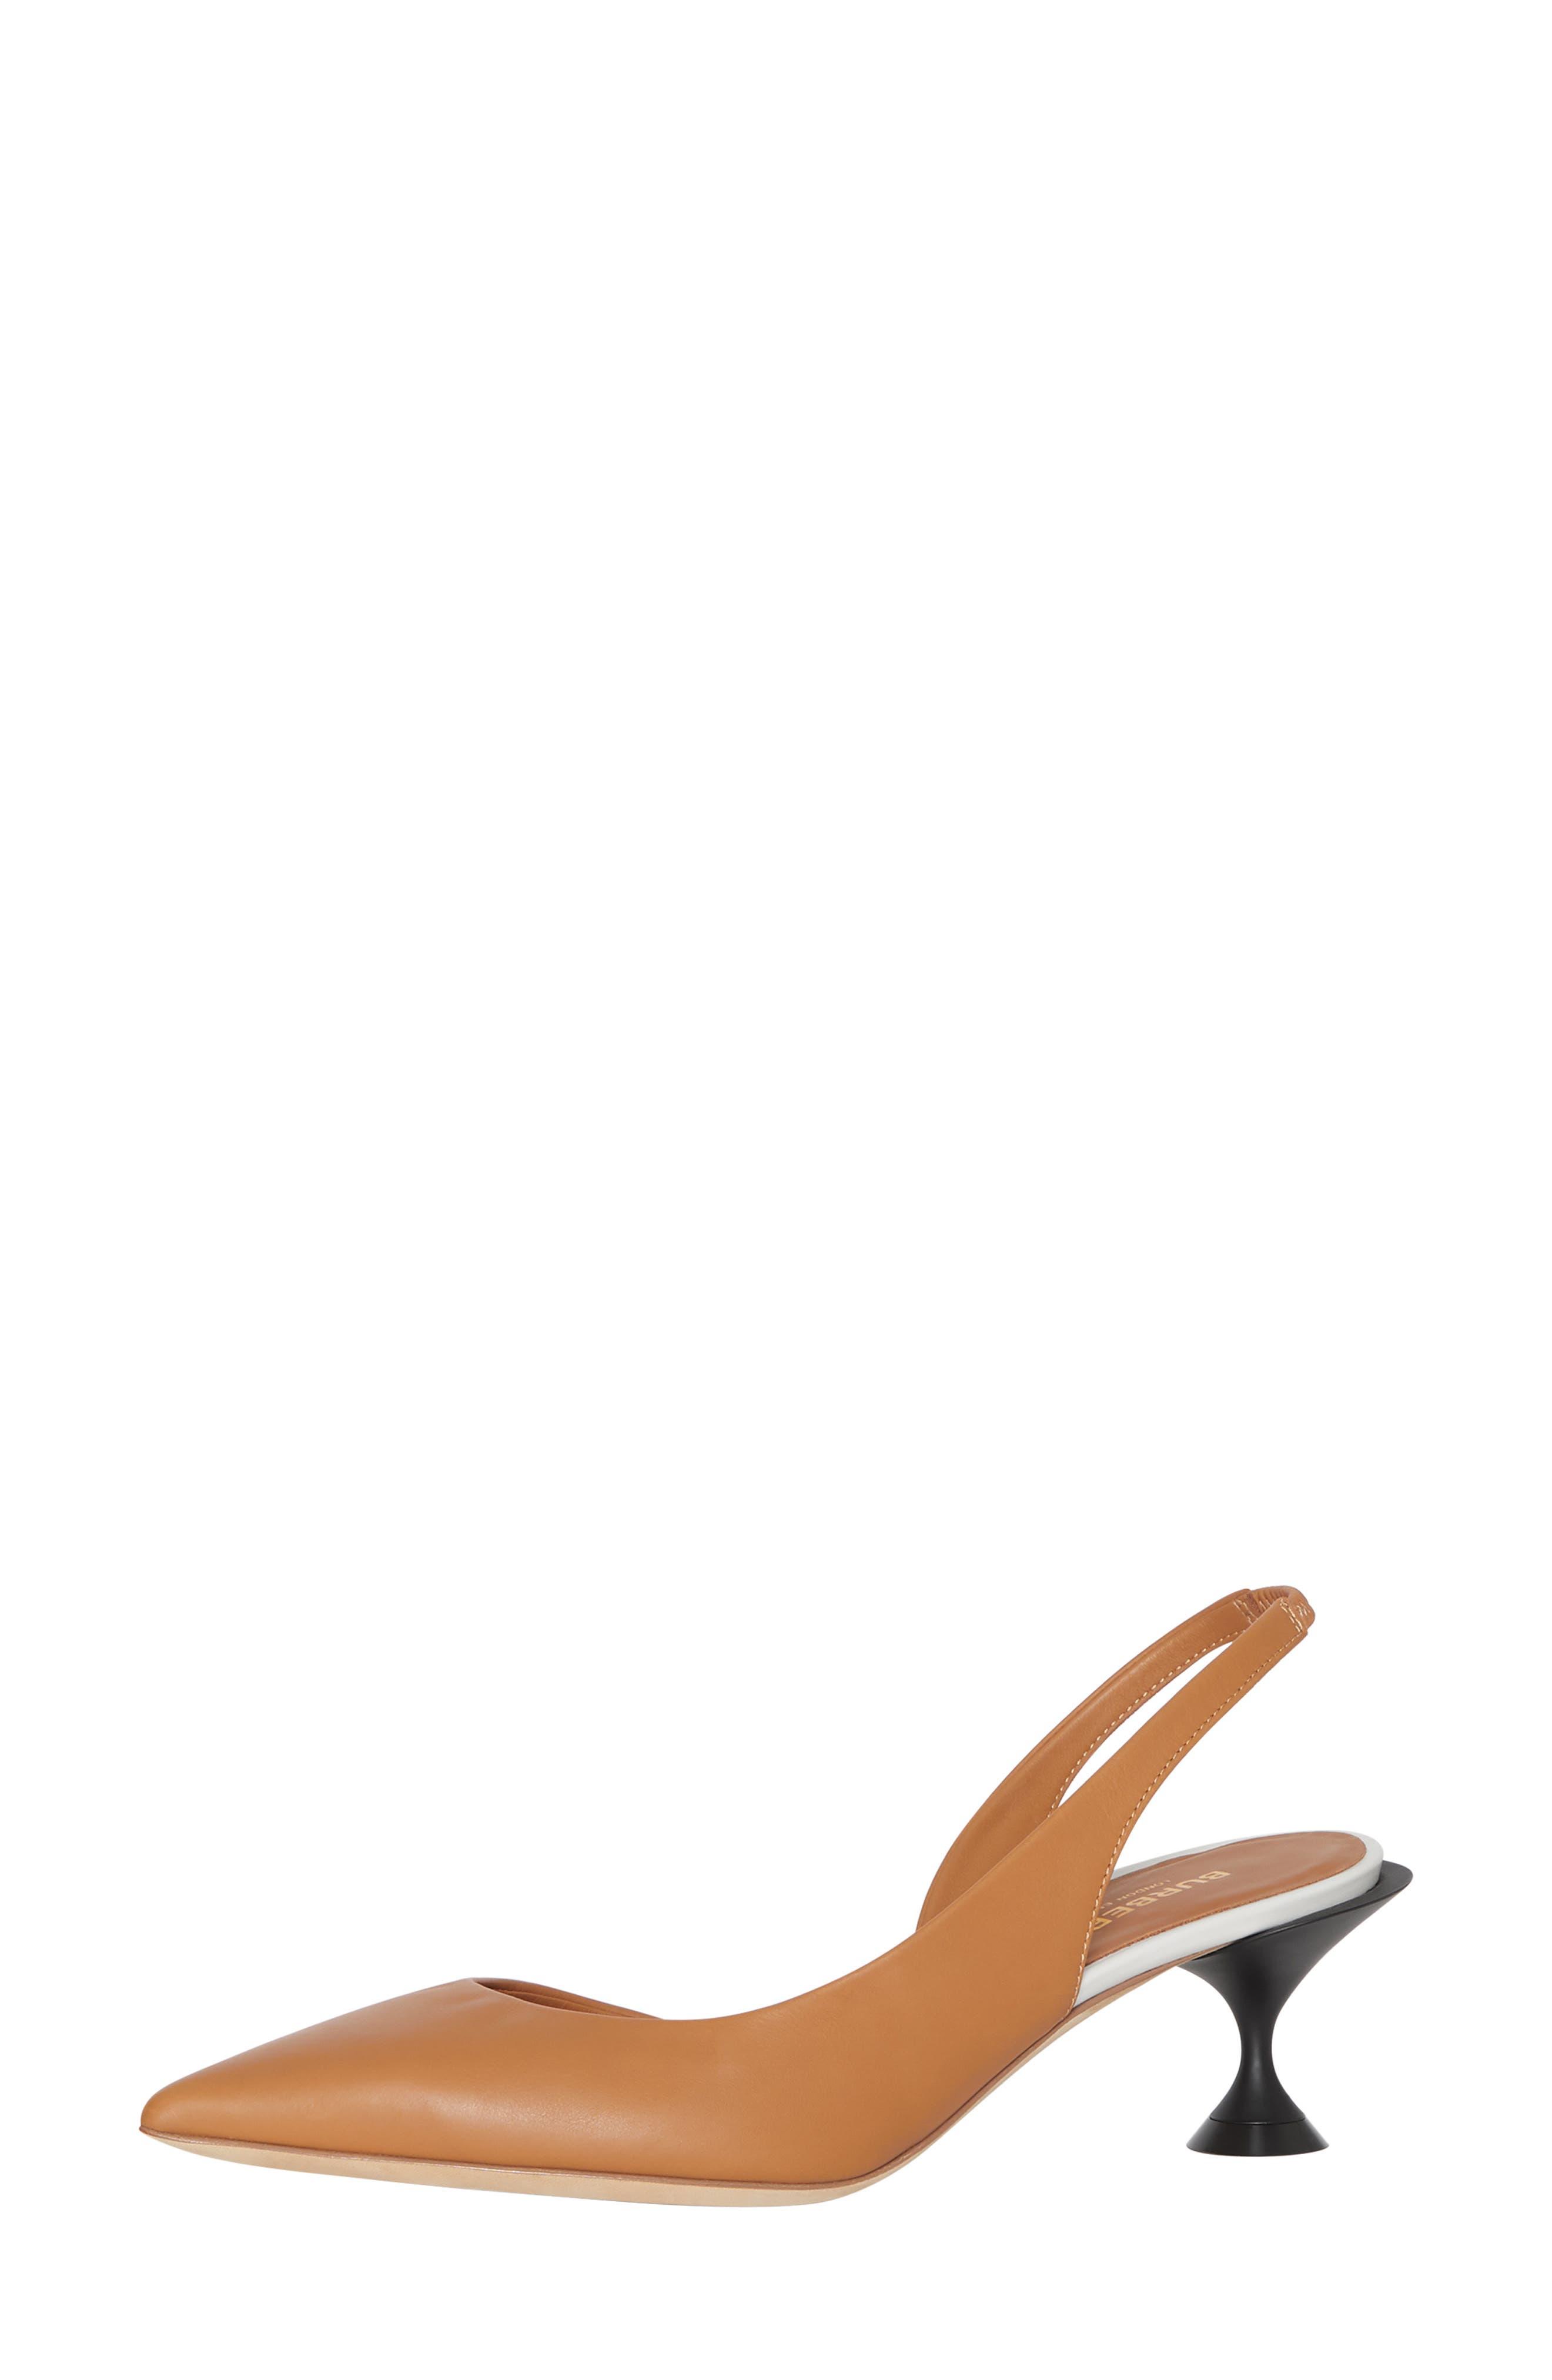 BURBERRY, Leticia Check Slingback Pump, Alternate thumbnail 8, color, CAMEL